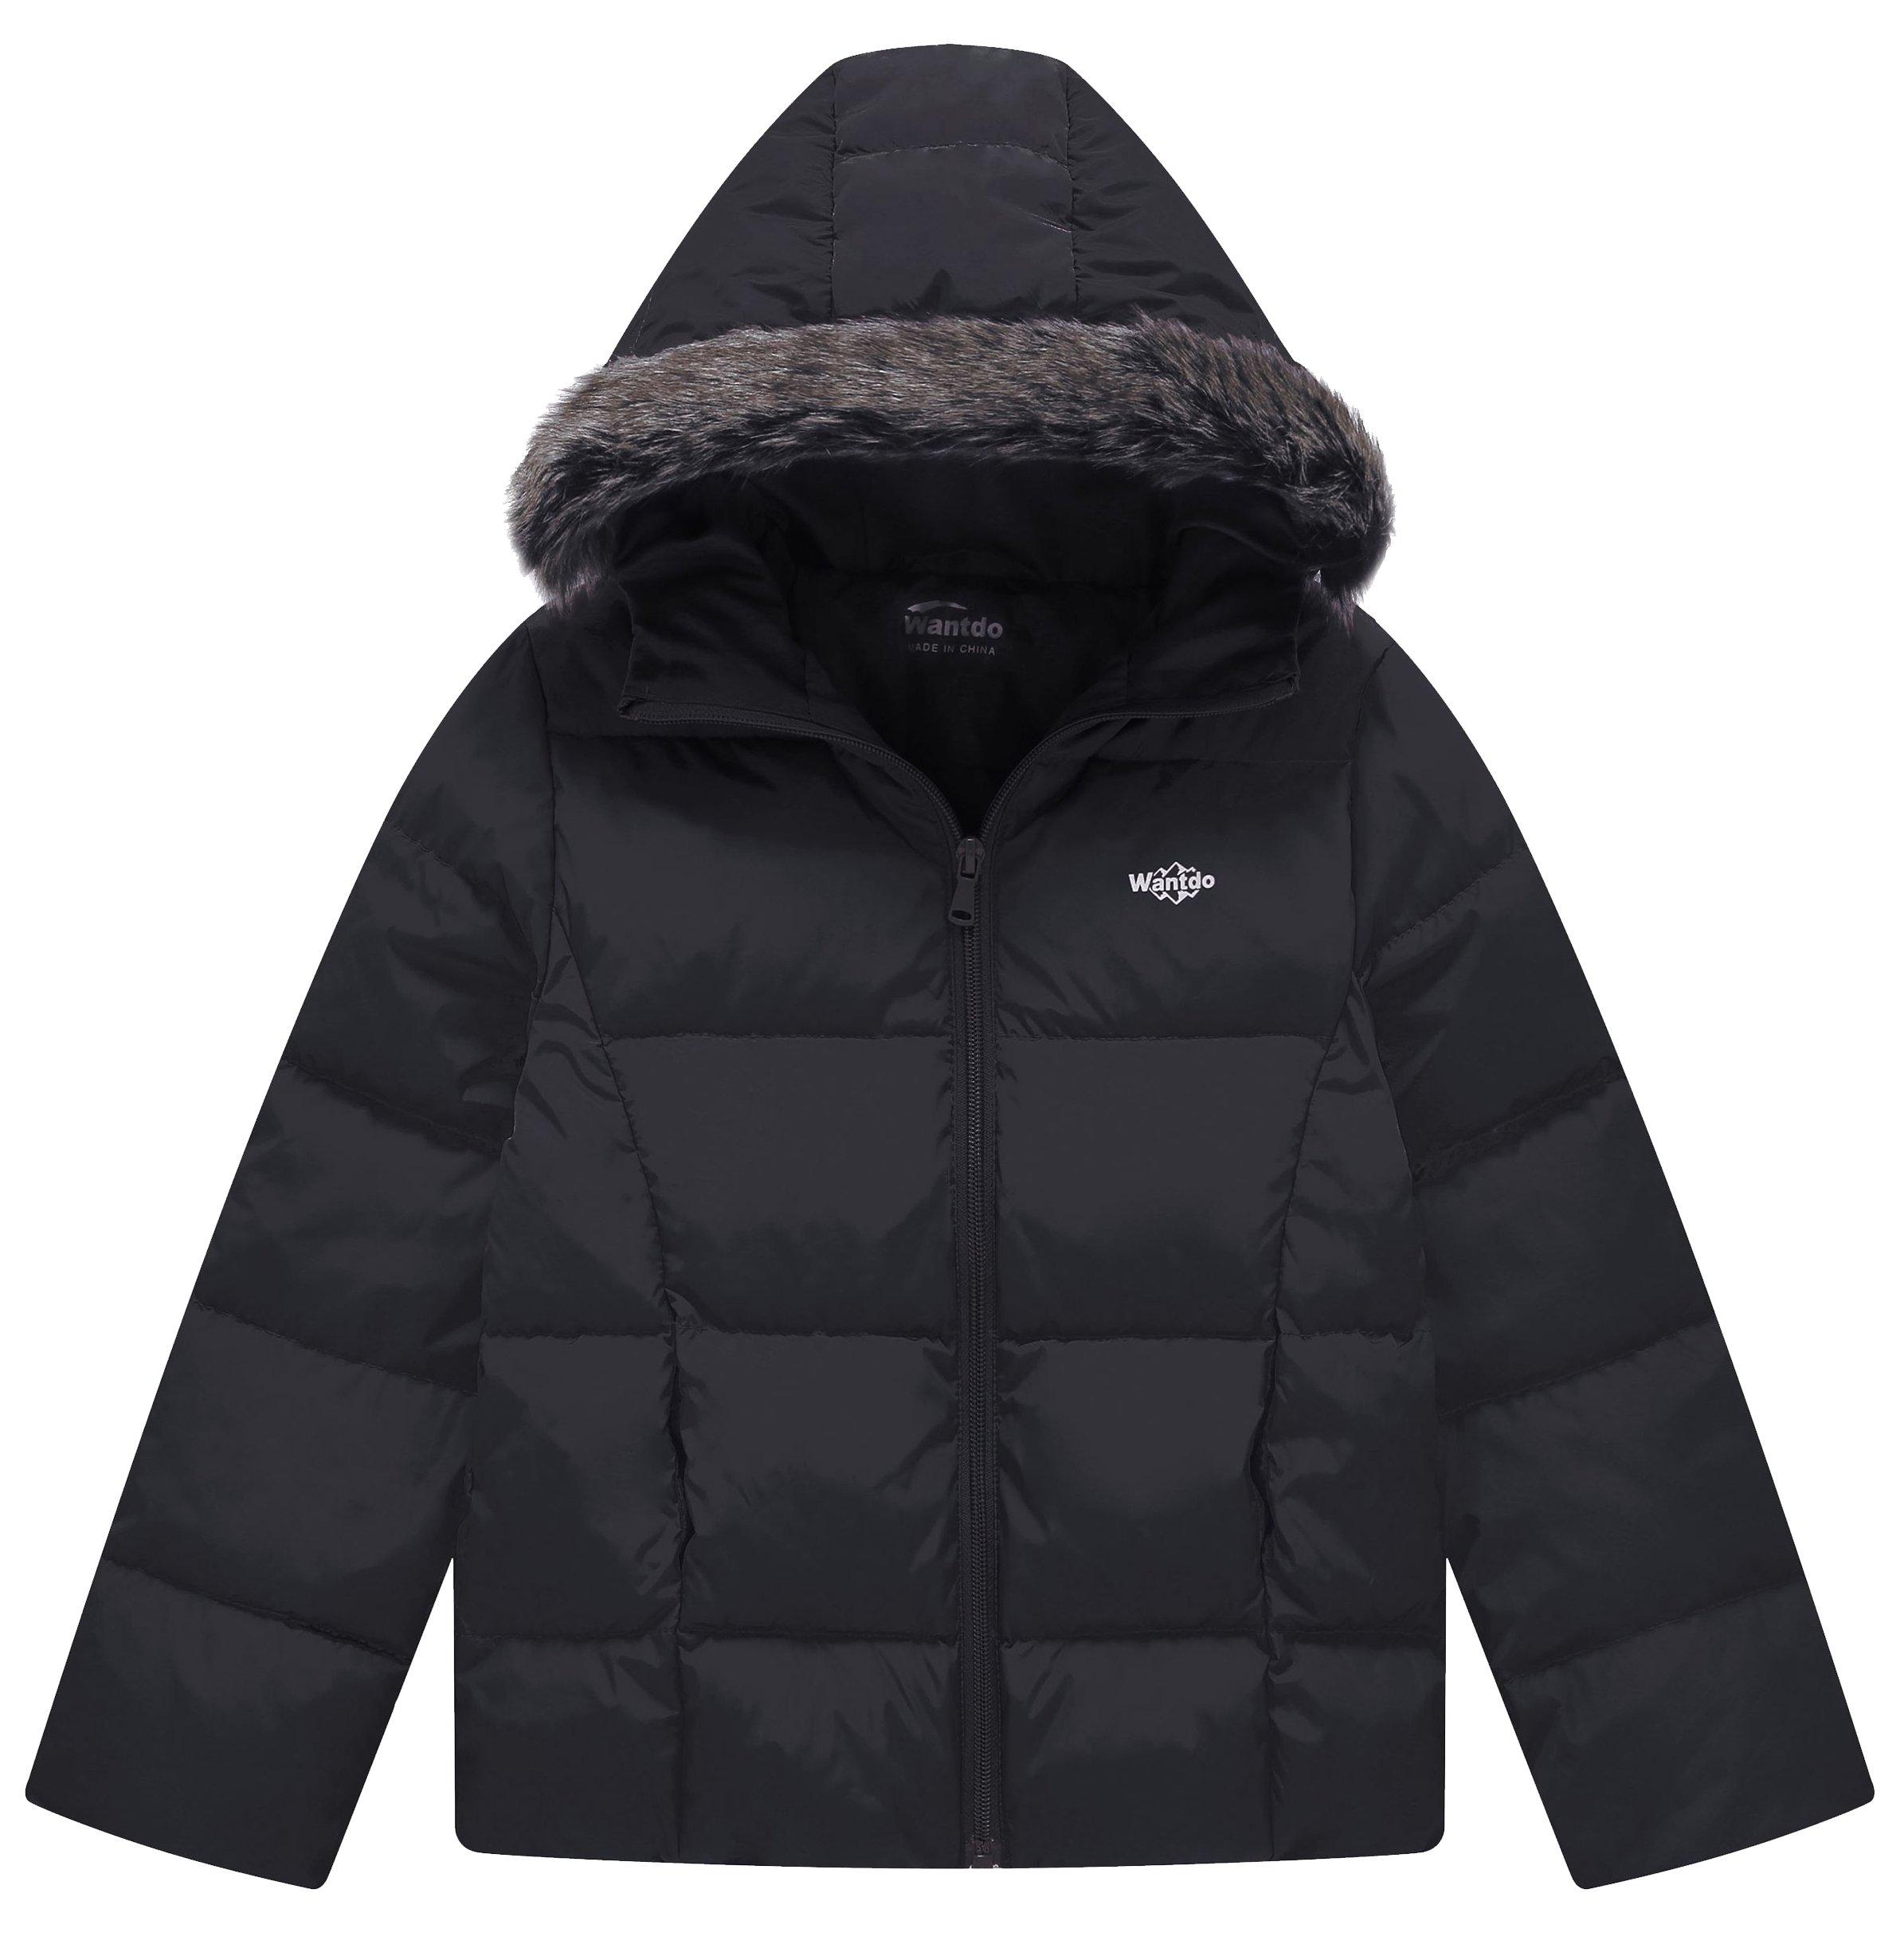 Wantdo Boy's Lightweight Puffer Down Jacket with Hood Packable Outdoor Anorak(Black, 8)